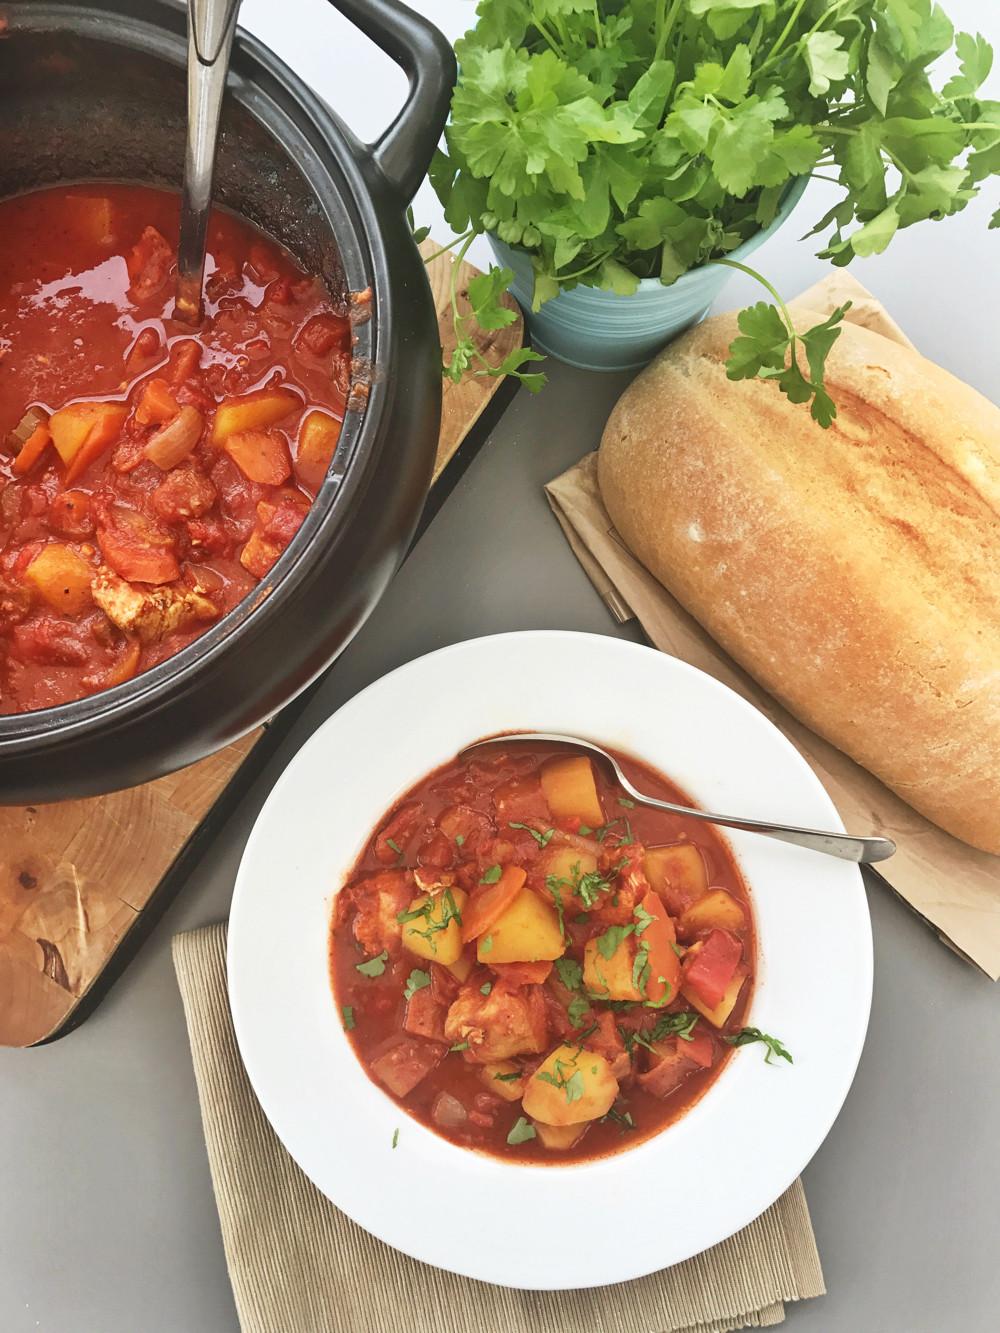 Slow Cooker Chicken Stew Recipes Healthy  Slow cooker Spanish chicken stew